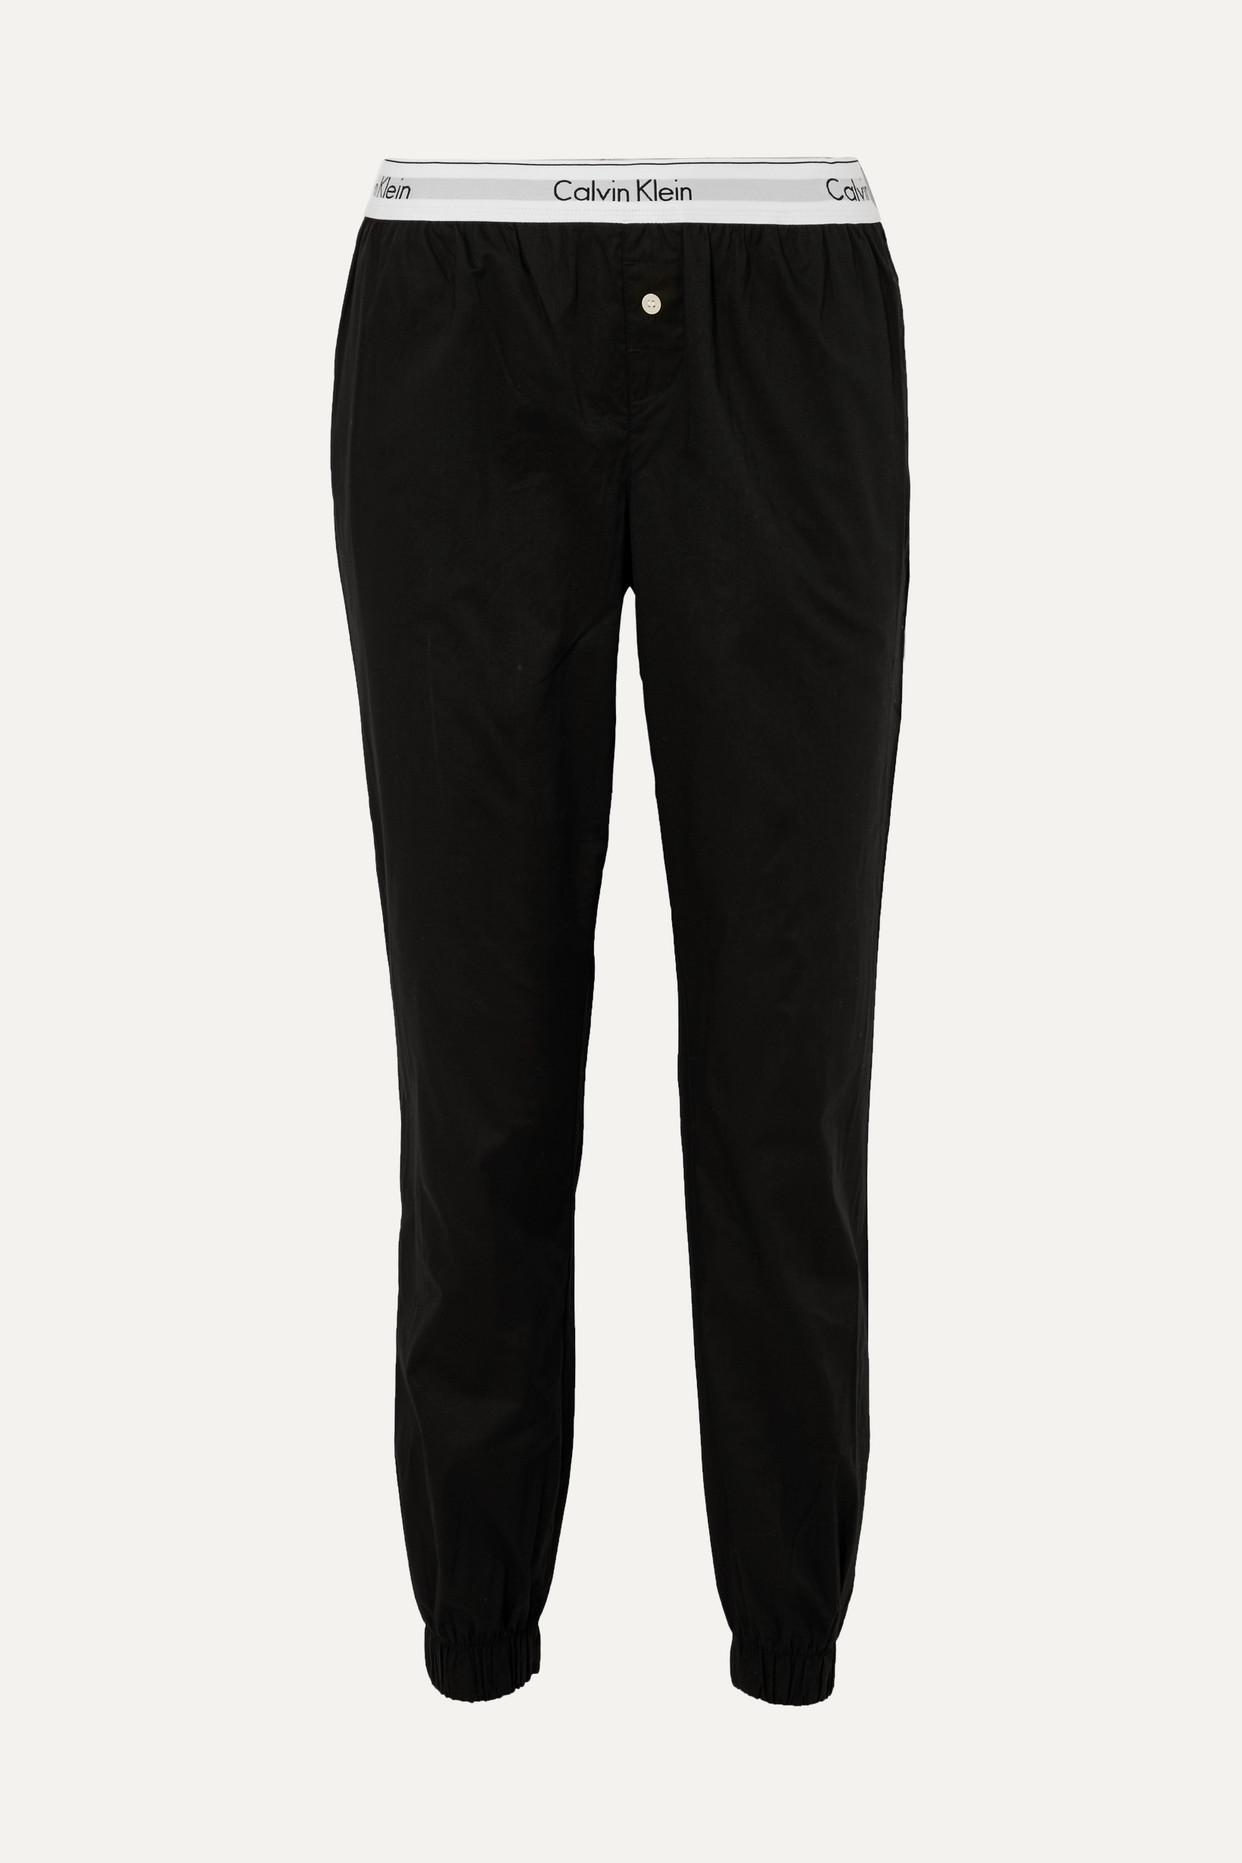 CALVIN KLEIN - Modern Cotton-poplin Track Pants - Black - small